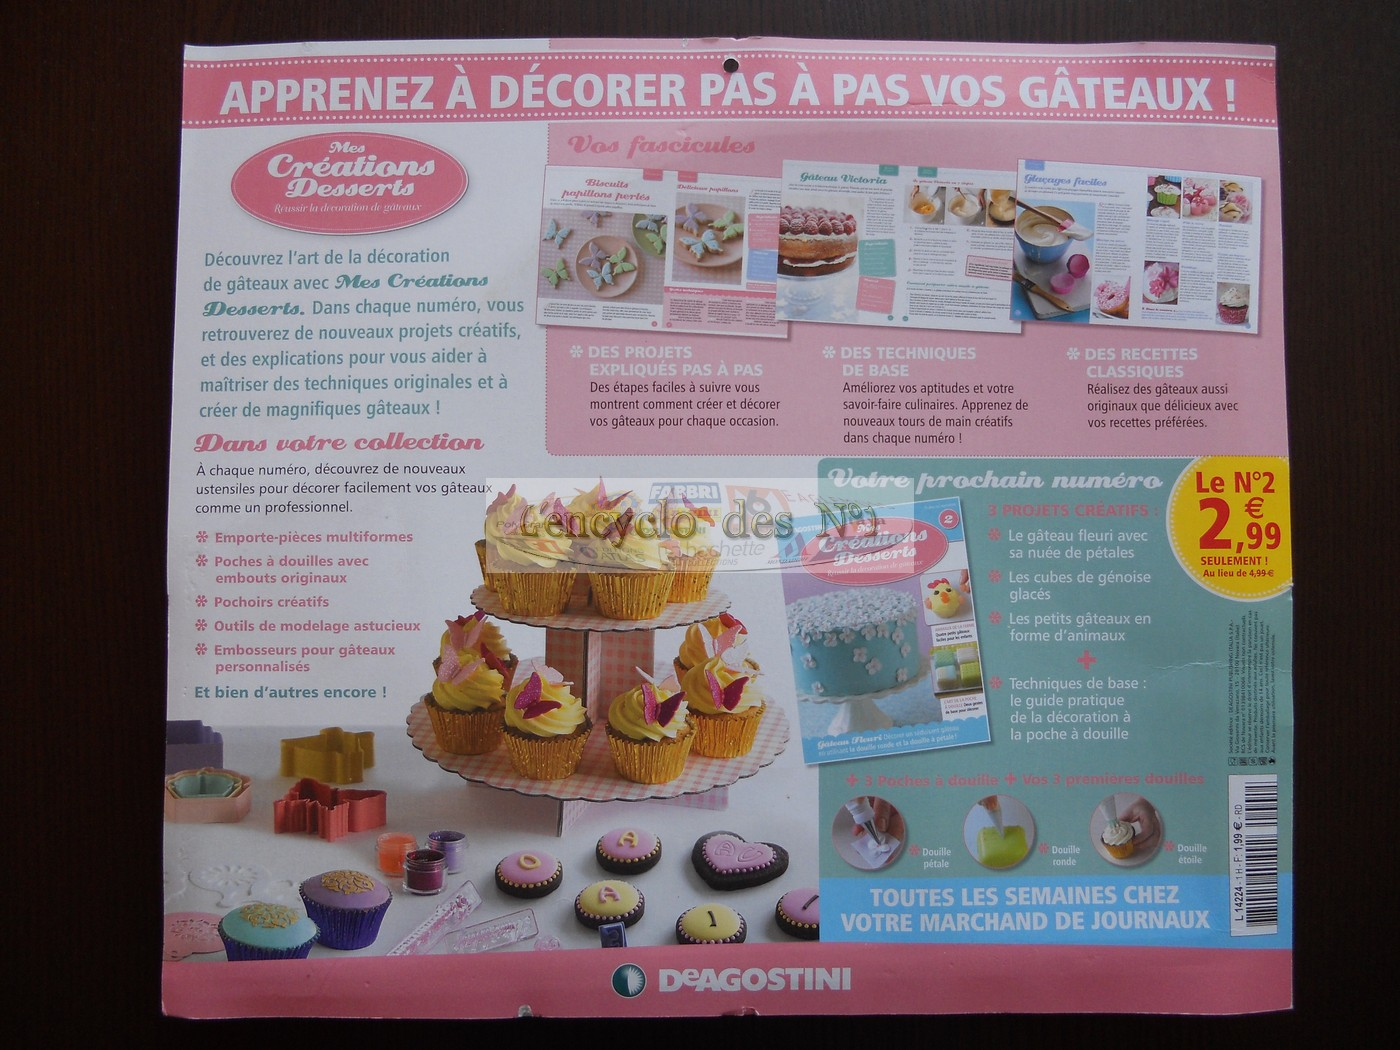 N° 1 Mes créations desserts - Test - DeAgostini - Mars 2012 Mod_html215849_4f68f3622028c